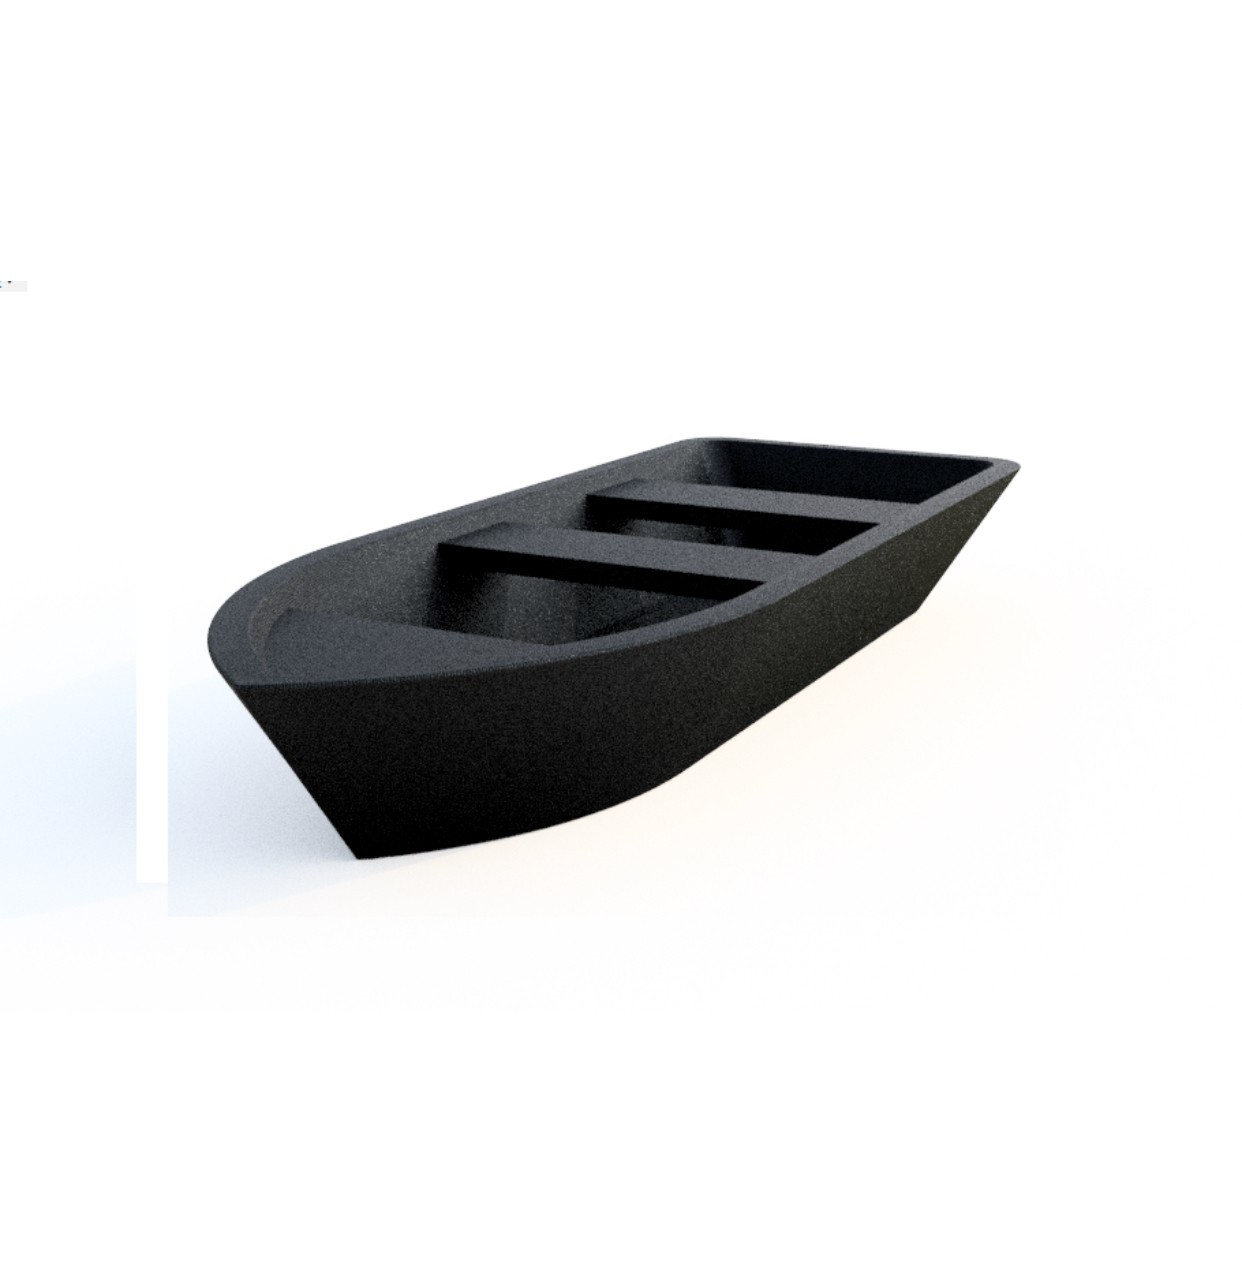 6F77FB8A-9B6B-48E5-8759-401CFB299D4A.jpeg Download STL file UPDATED - Wooden Paddle Boat • 3D printable design, AnthonyVanVolkinburg